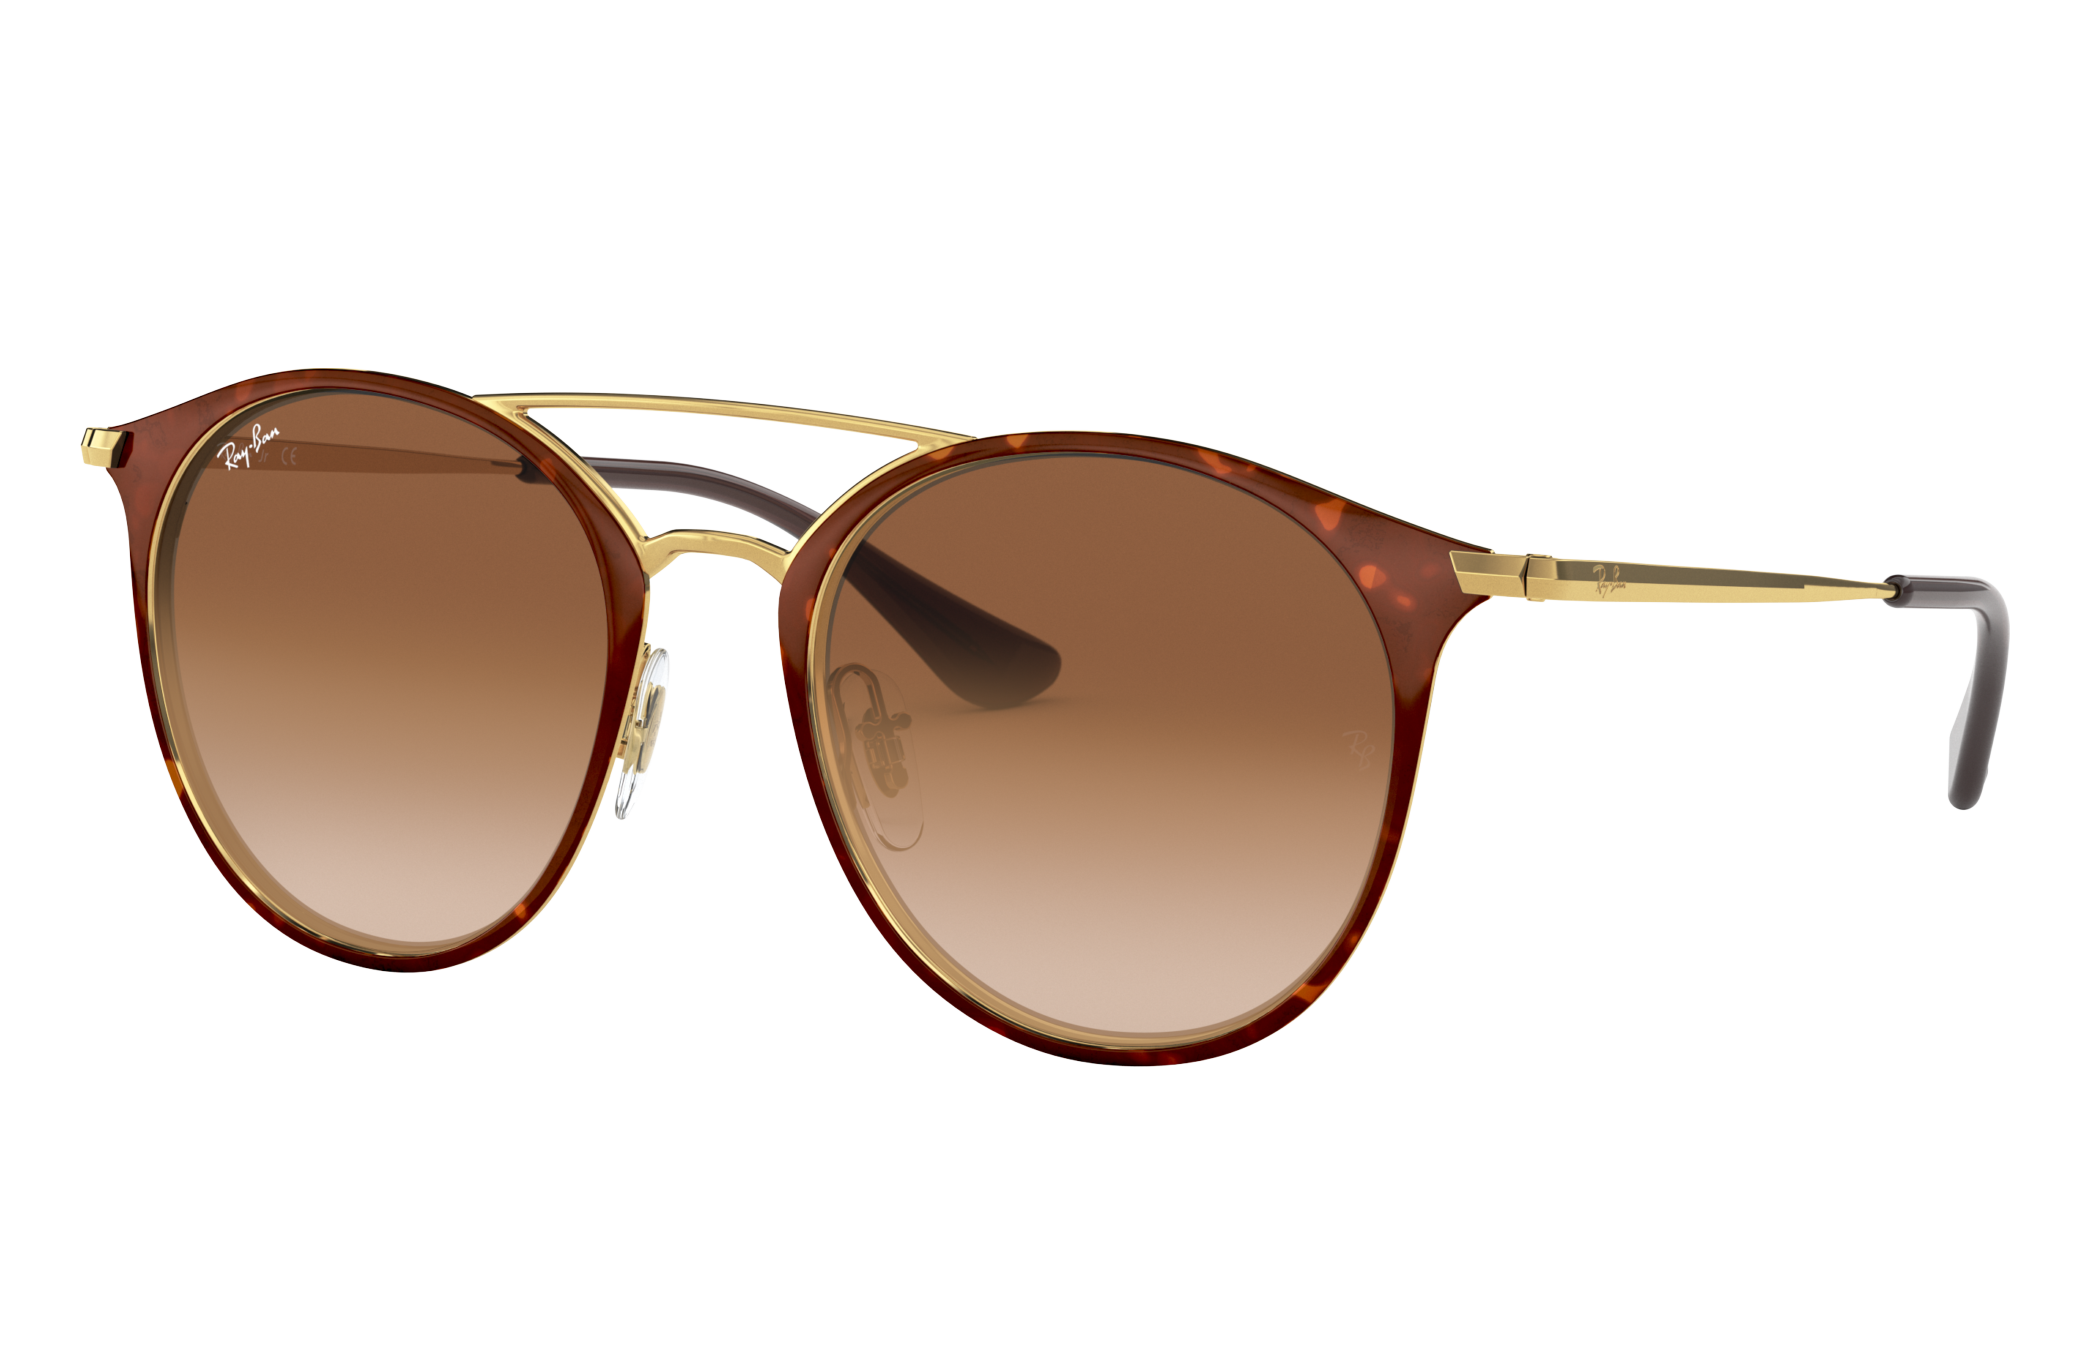 Ray-Ban Rj9545s Gold, Brown Lenses - RJ9545S